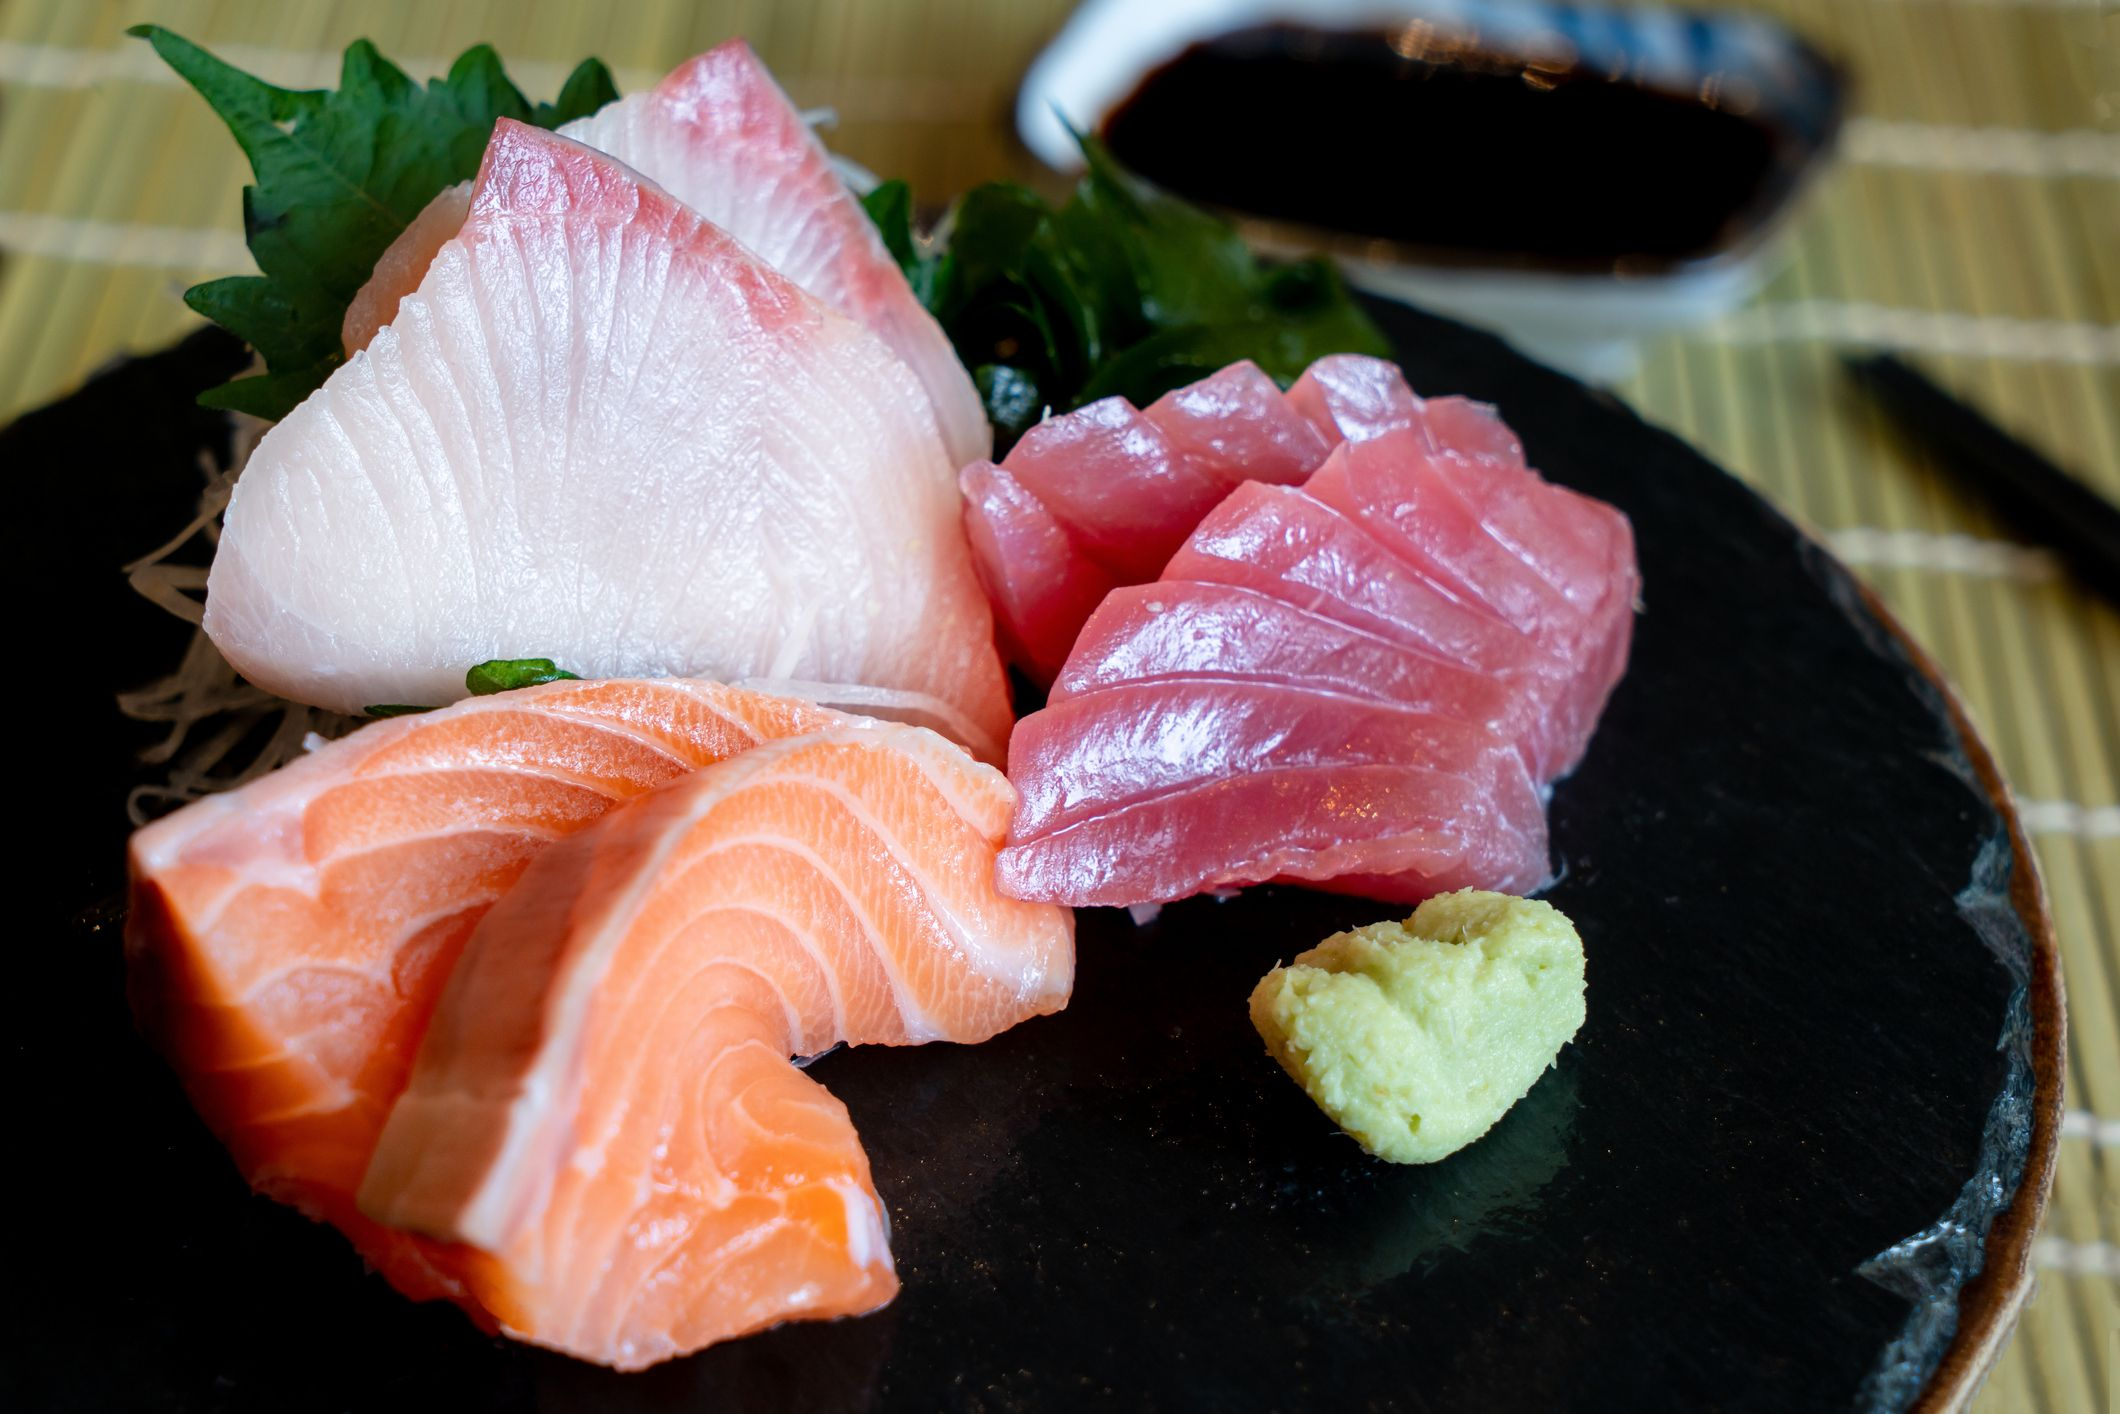 Raw fish Sashimi traditional Japanese food set includes Raw Salmon, Raw Tuna, Raw Yellow Tail (Hamachi) Sliced with sliced radish and vegetable